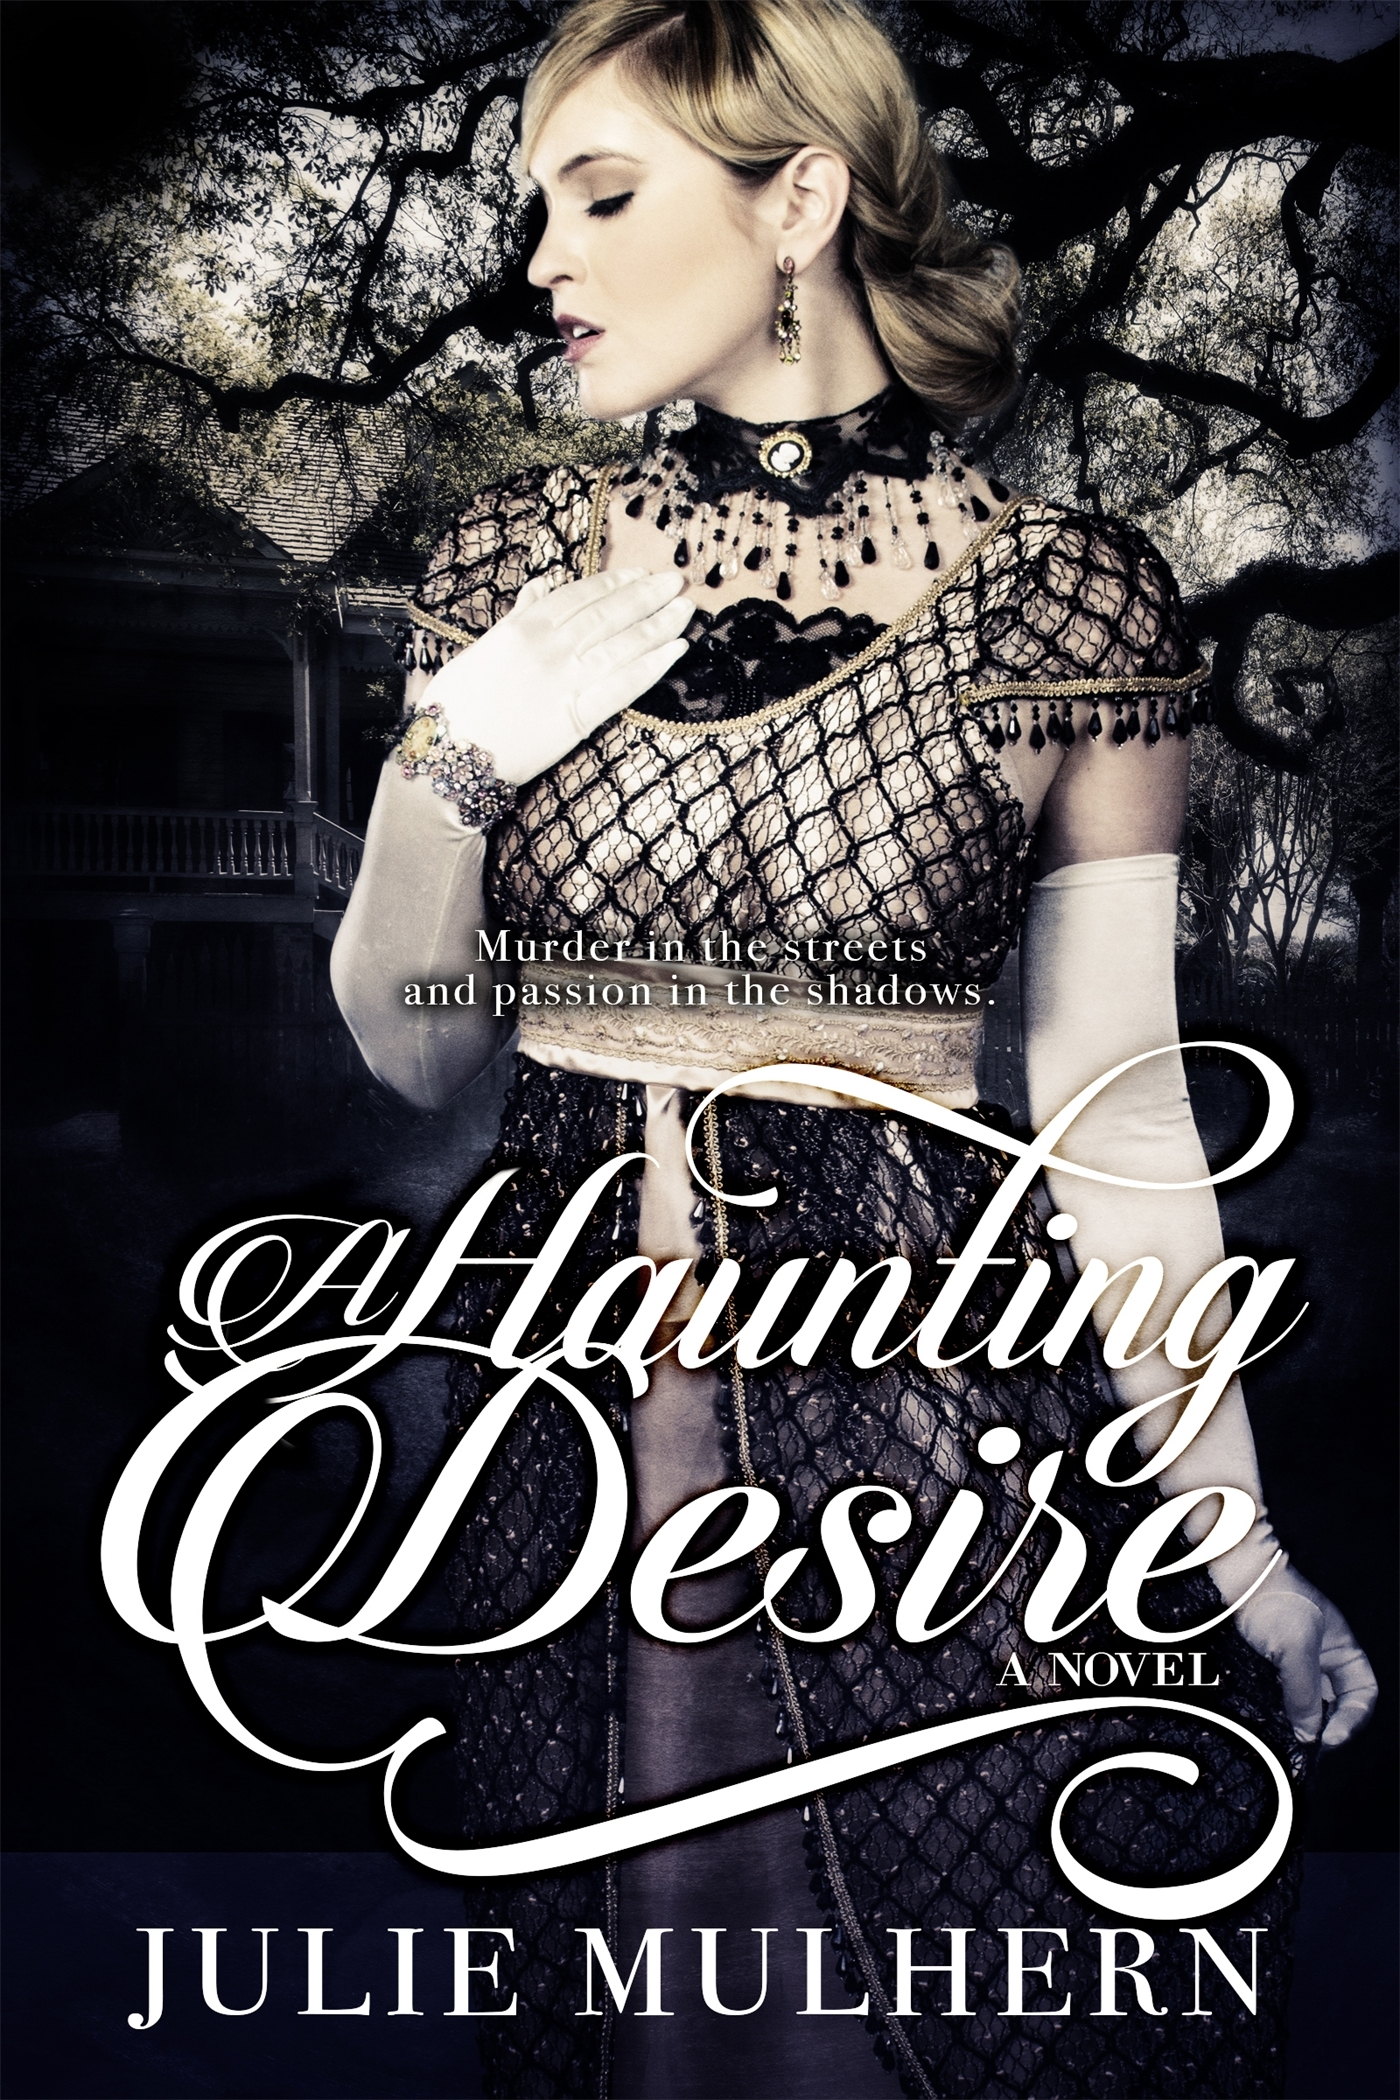 A Haunting Desire Julie Mulhern